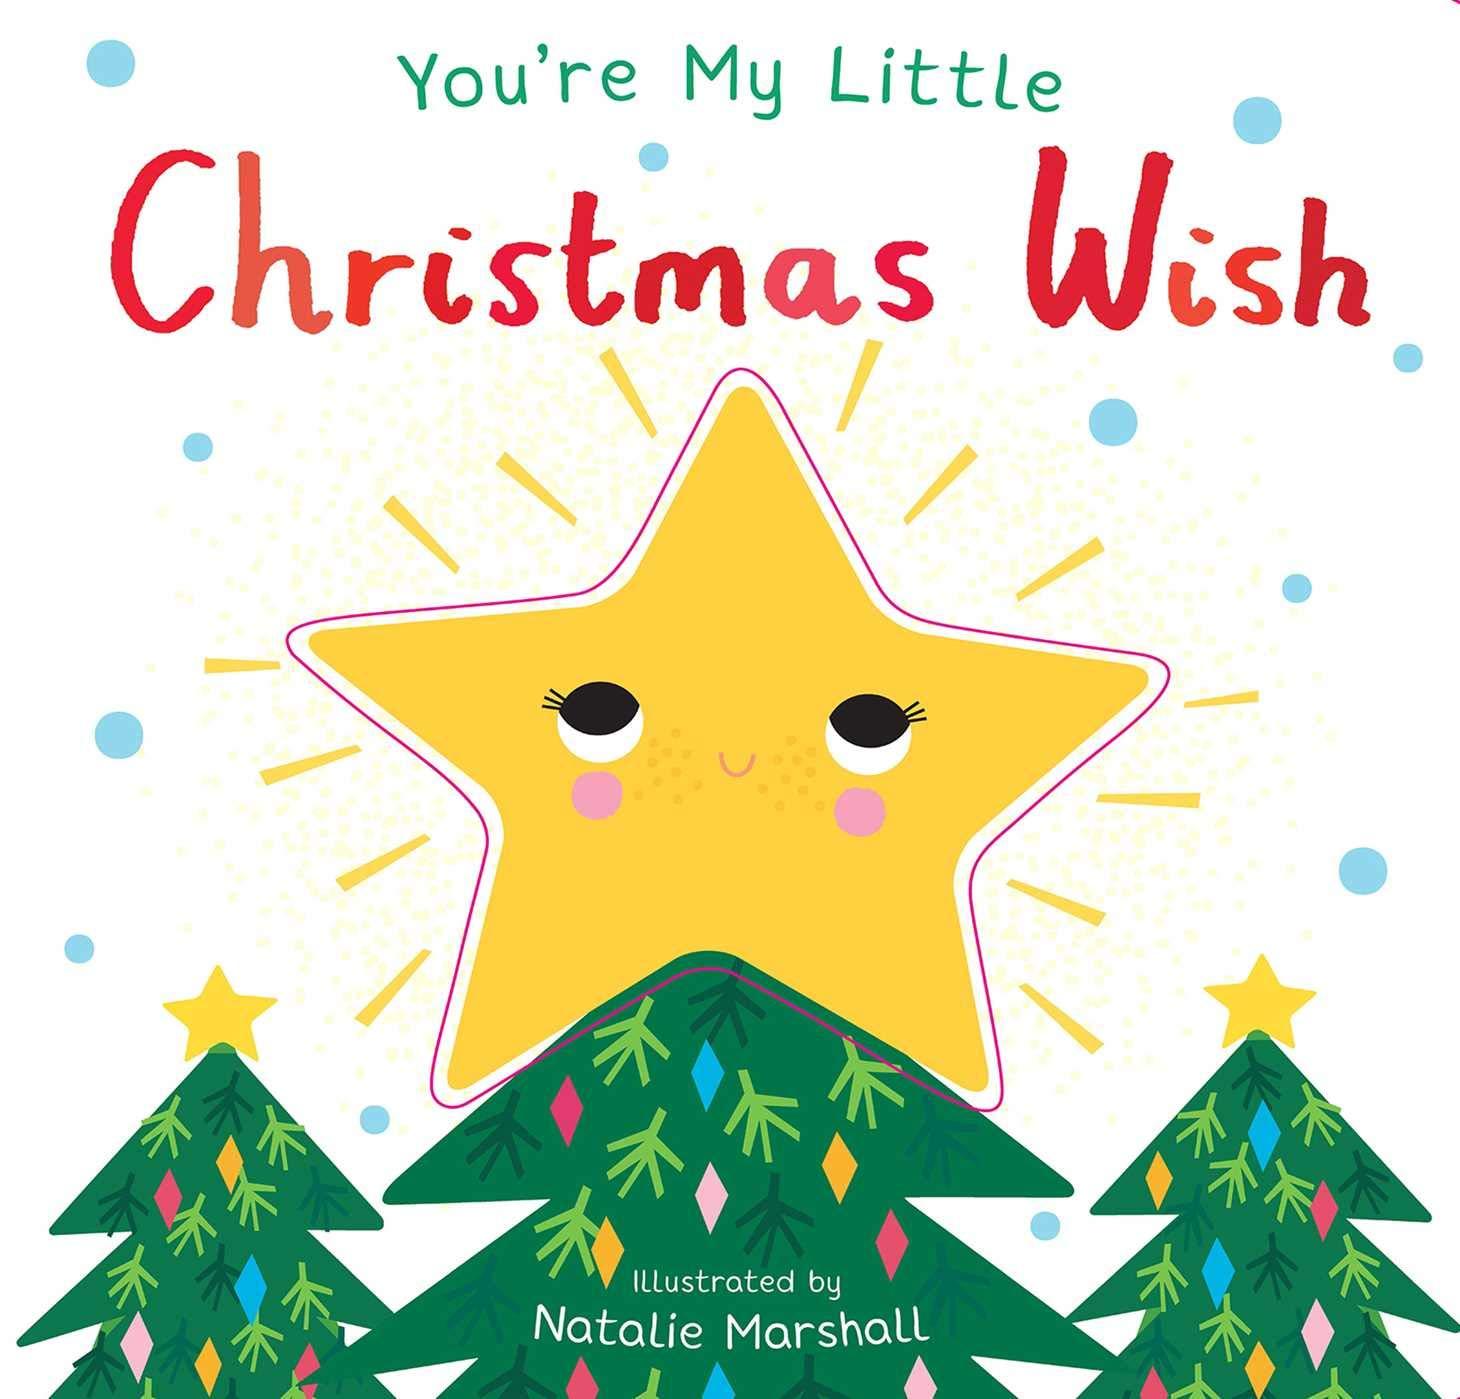 Amazon.com: You're My Little Christmas Wish (9781684126750): Edwards,  Nicola, Marshall, Natalie: Books